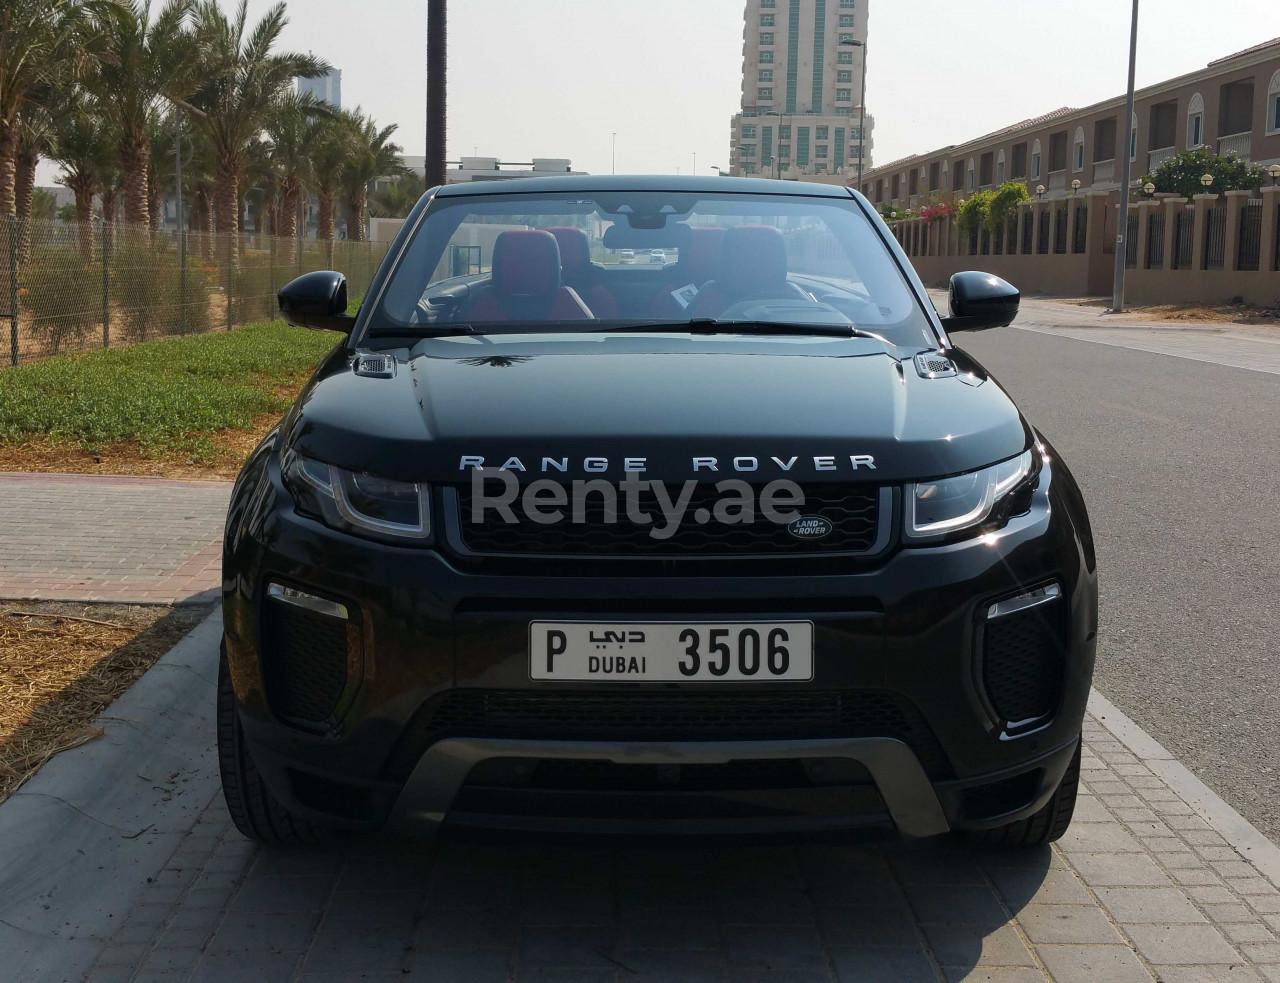 Range Rover Evoque Convertible for rent in Dubai at Renty - photo 0